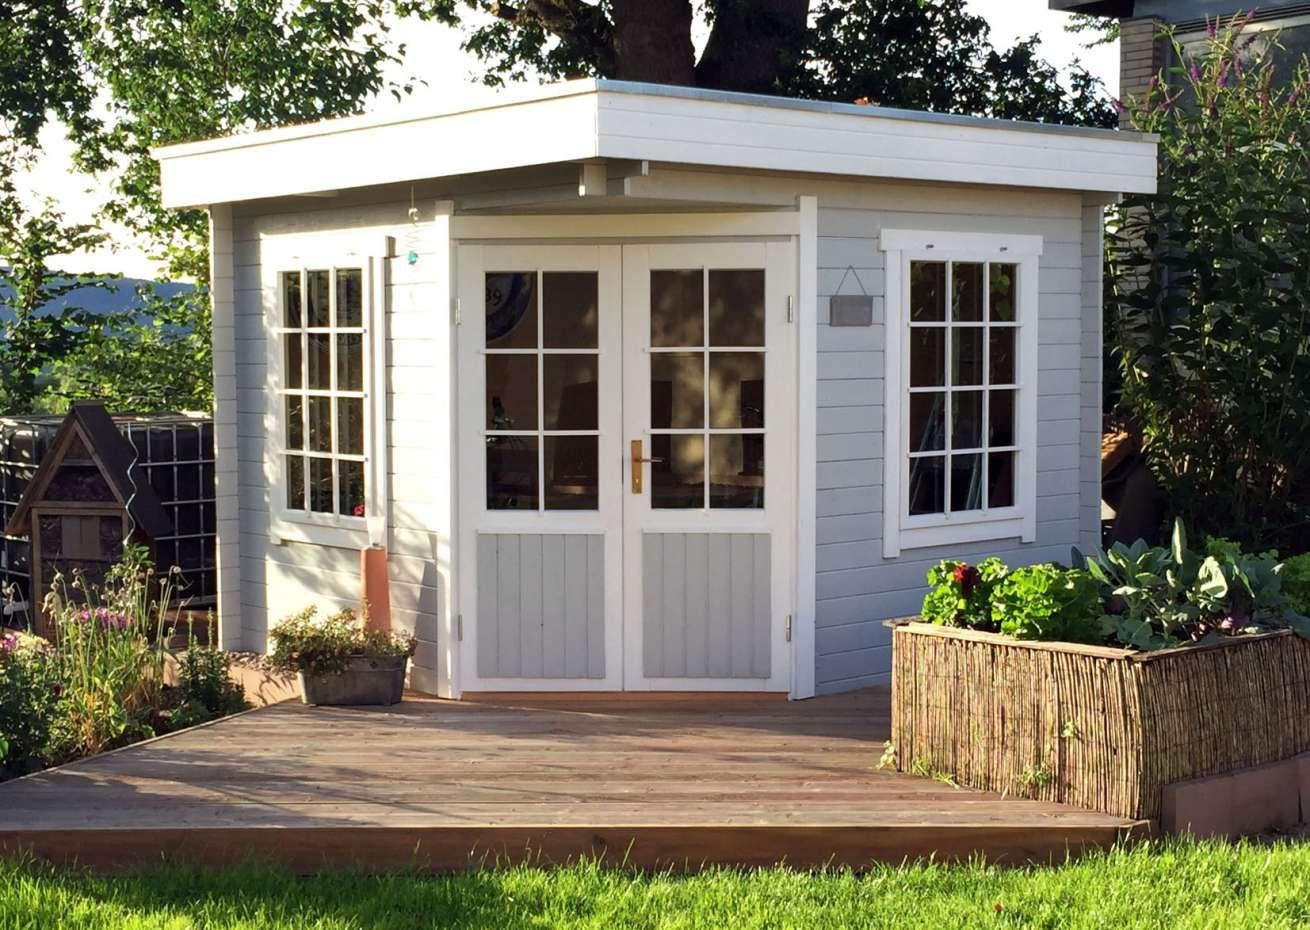 5Eck Gartenhaus Modell Monica28 mit Flachdach 5 eck